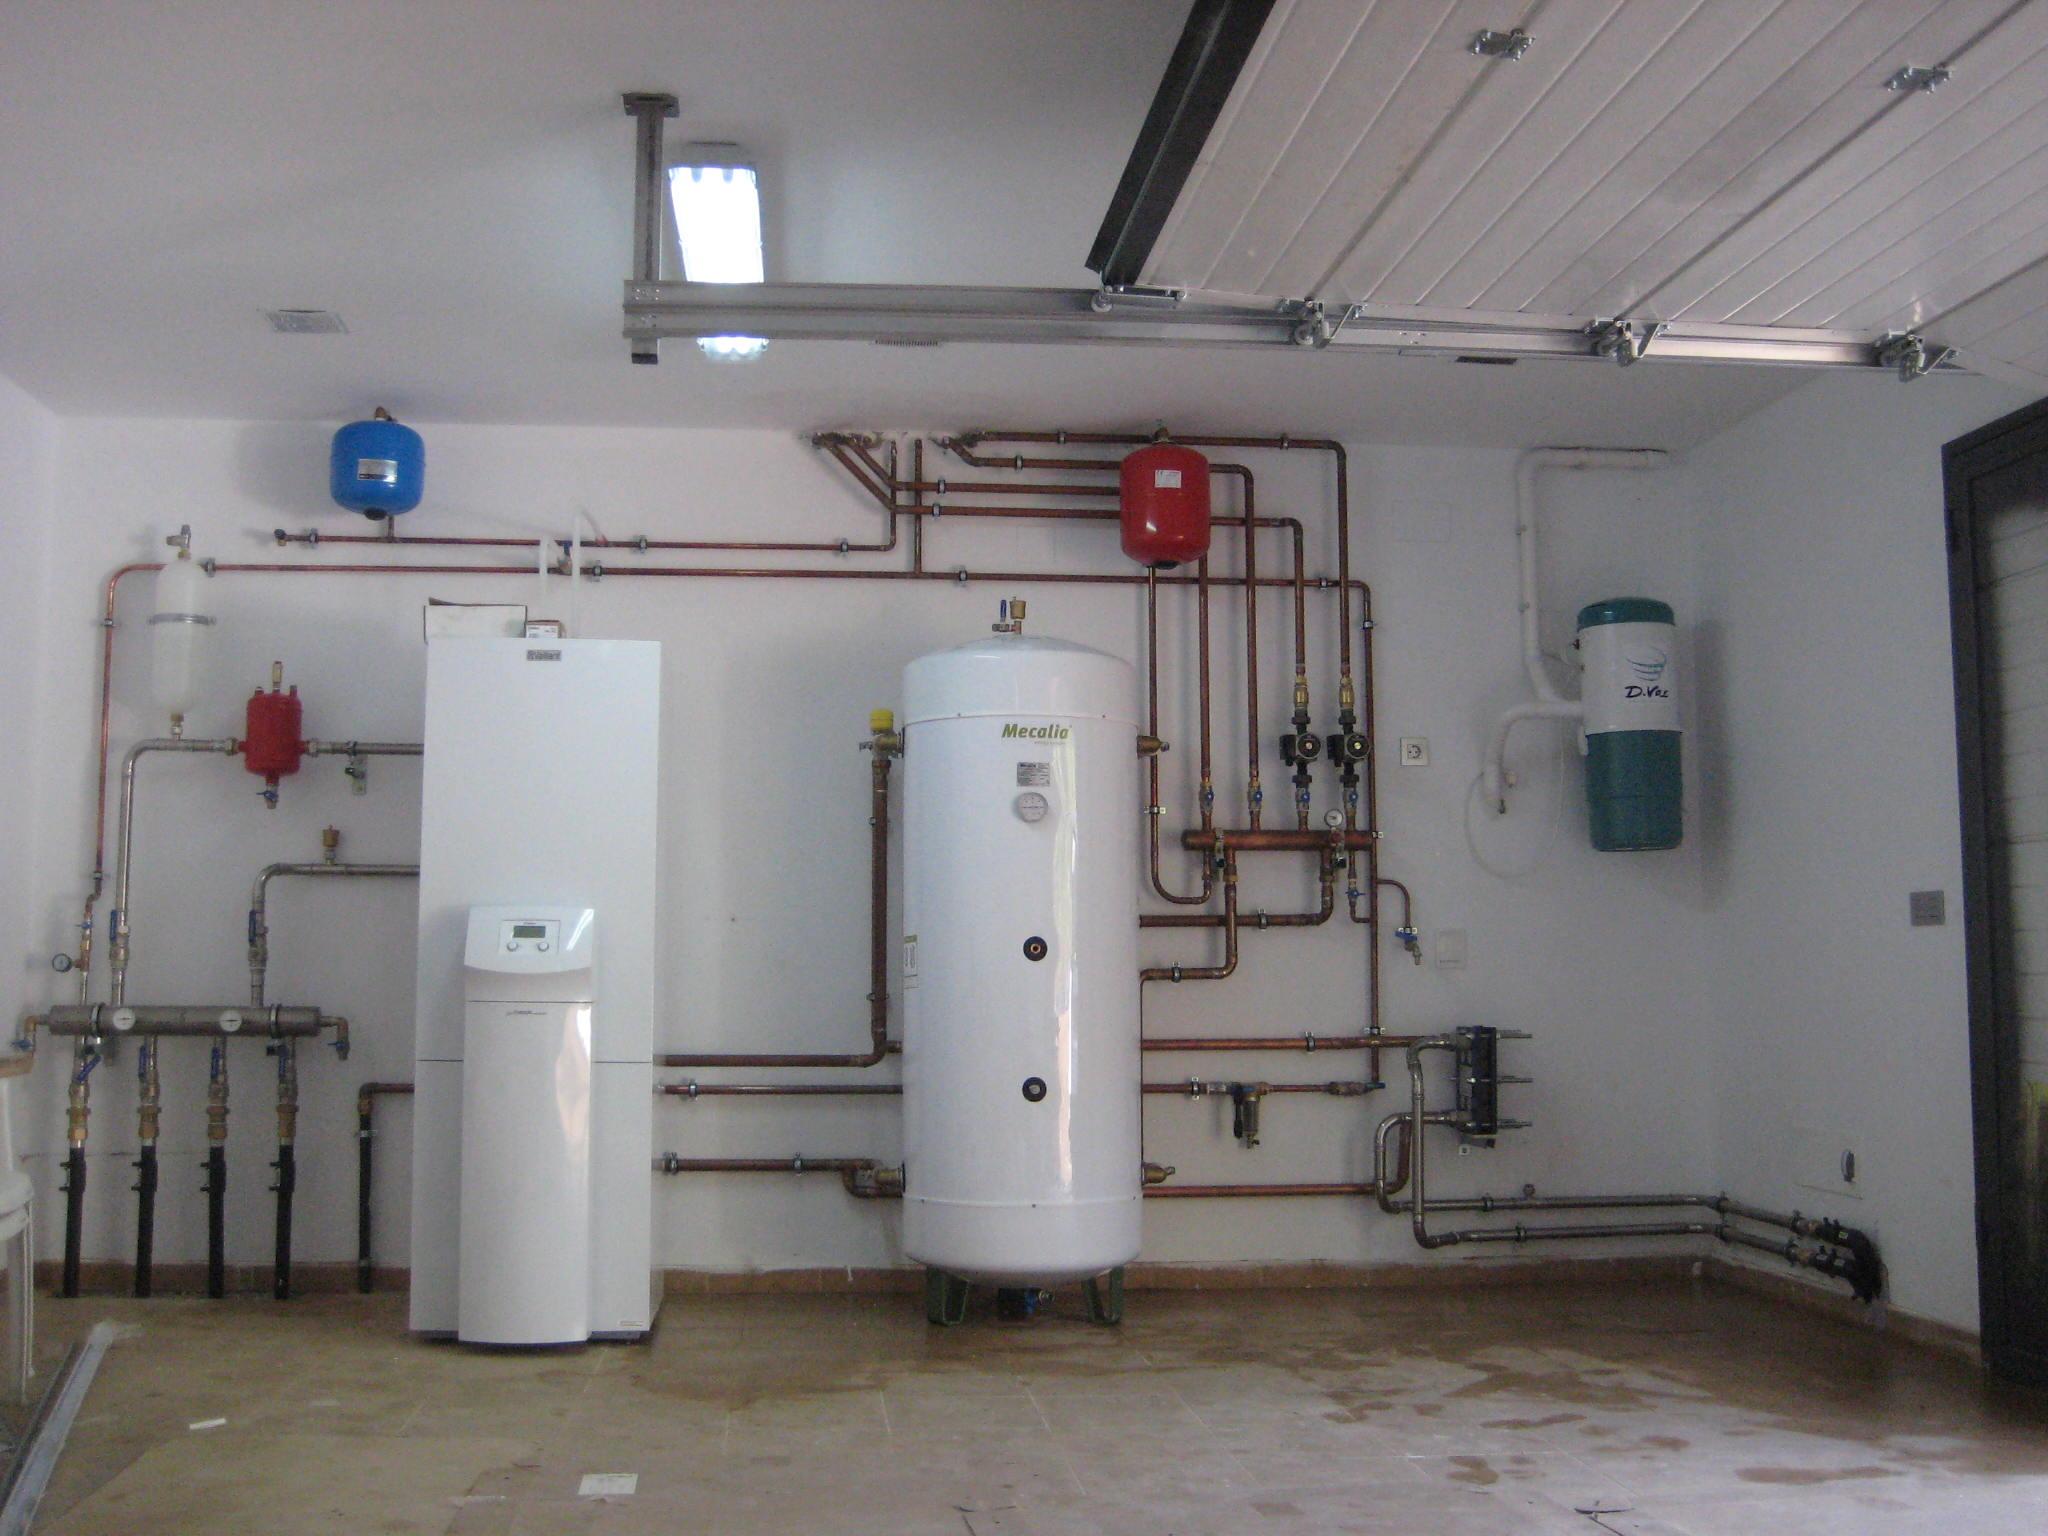 Geotermia la energ a m s cercana - Temperatura ideal calefaccion casa ...